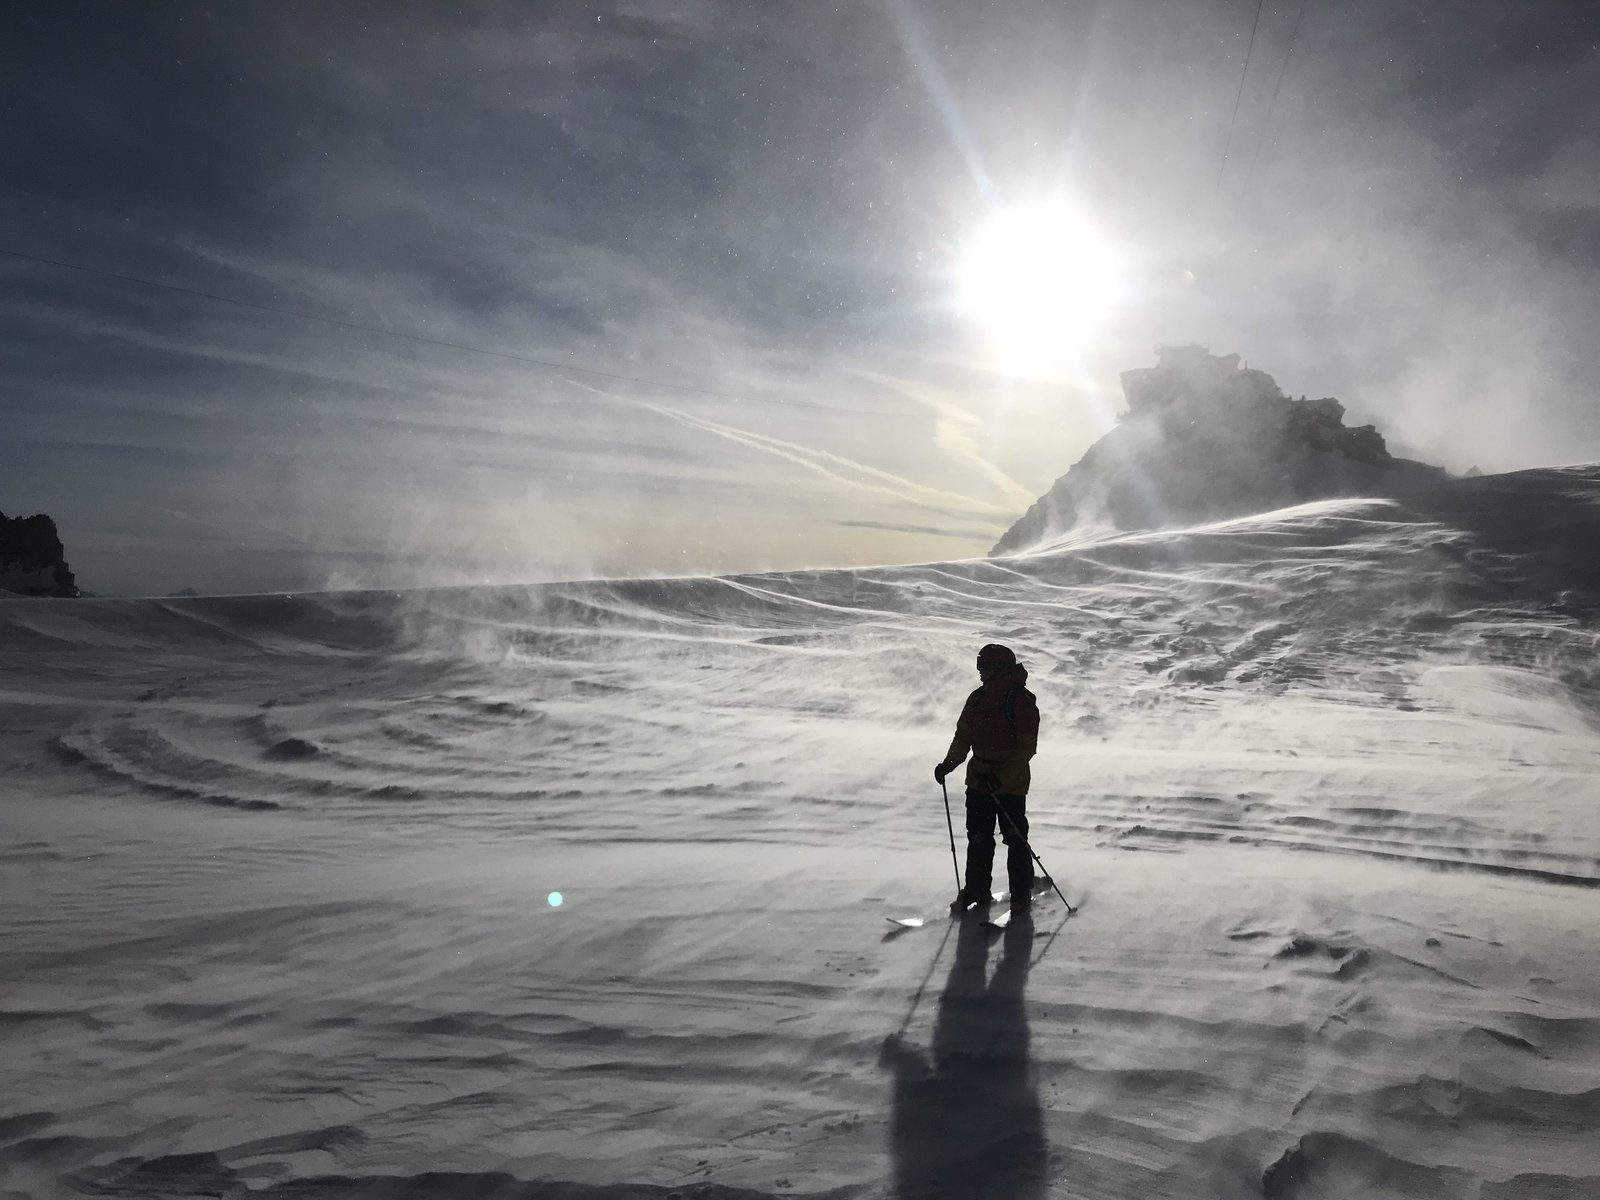 Glacier Runs - Vertical Drop